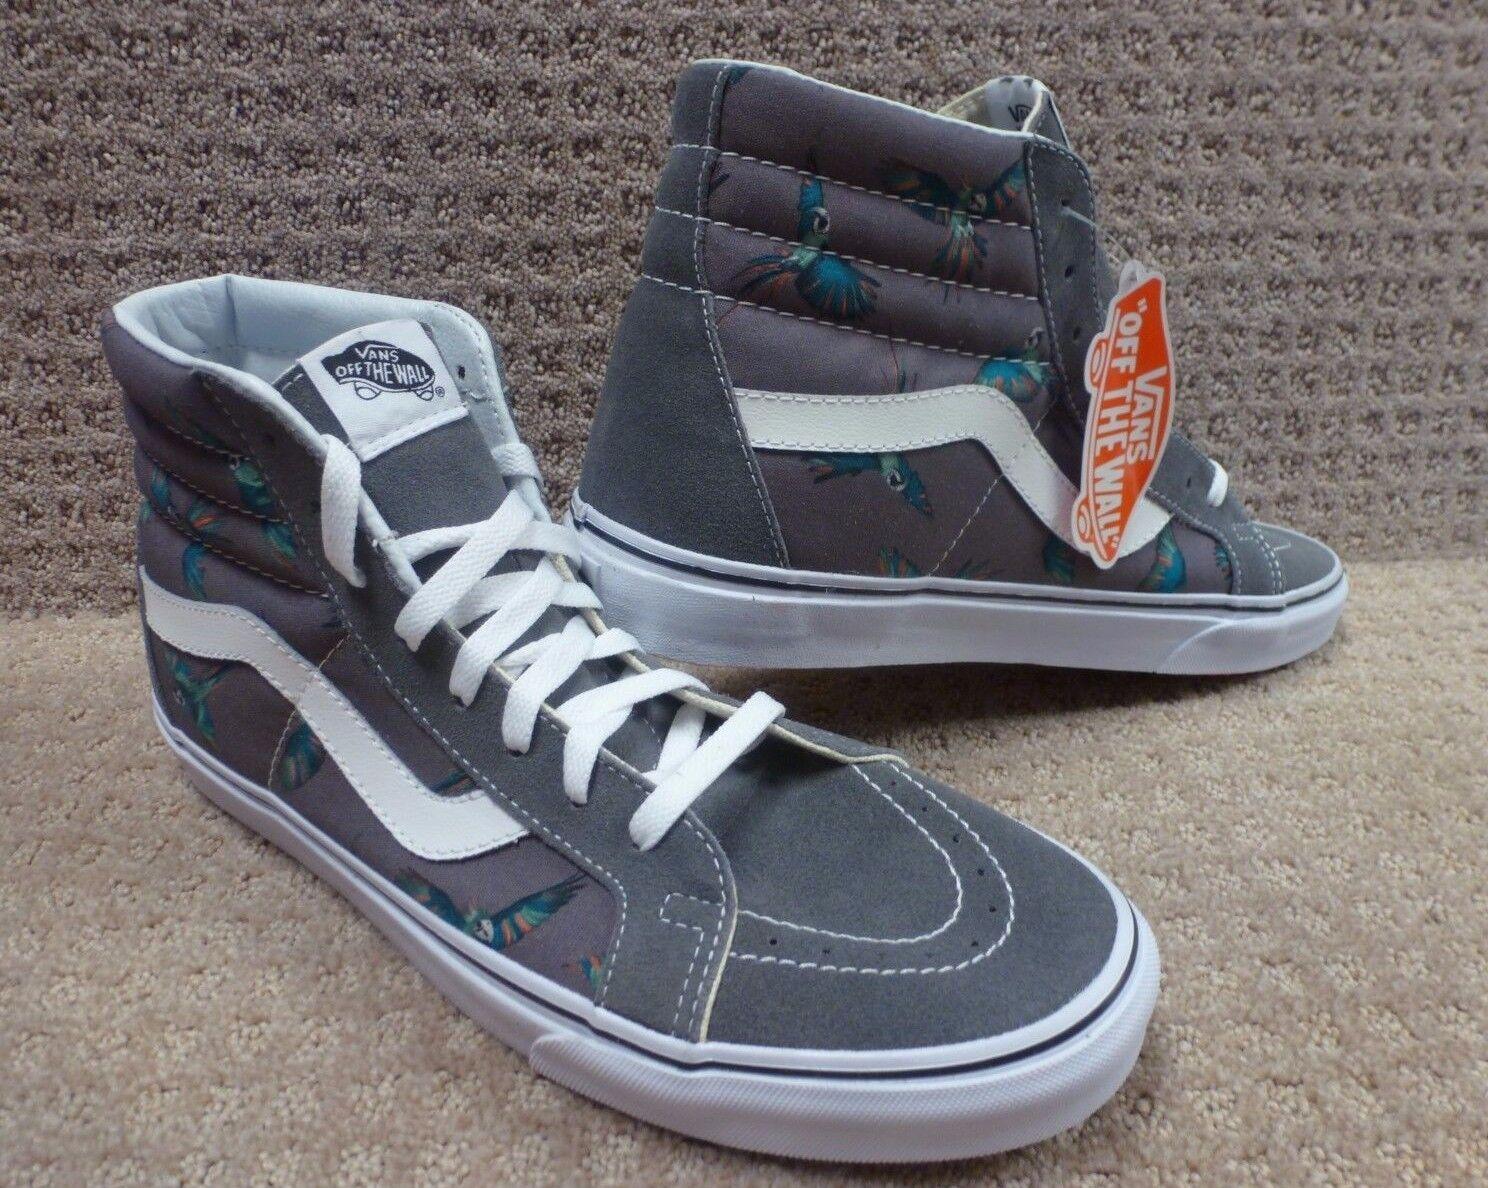 Vans Men's shoes  Sk8-Hi Reissue  -- (Dirty Bird) PWTR True Wht